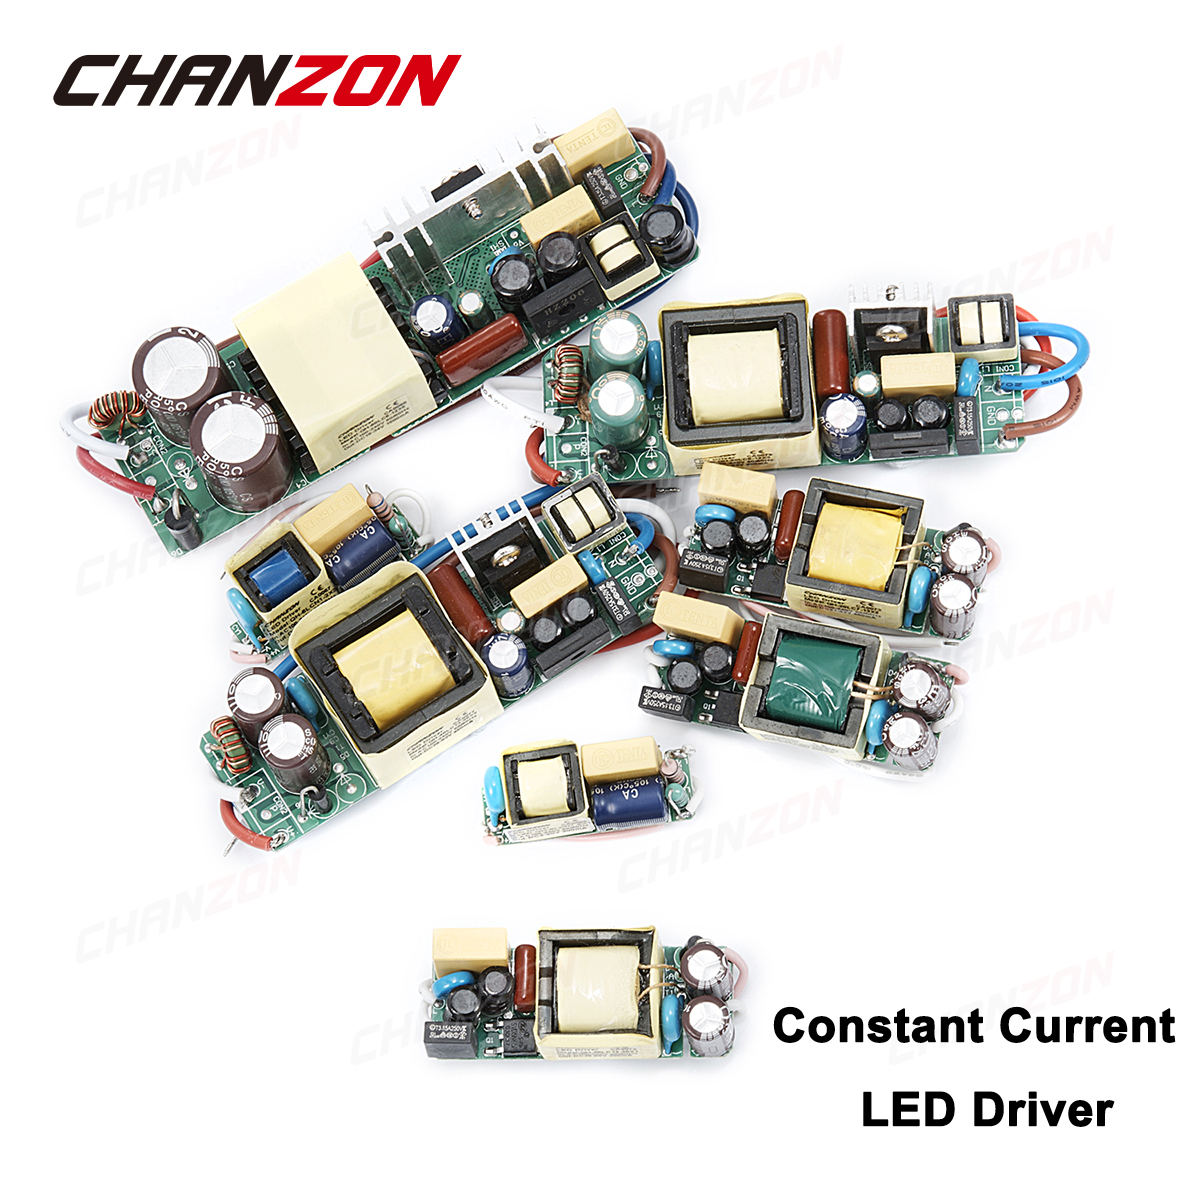 Constant Current LED Driver 1W 3W 5W 10W 20W 30W 50W 300mA 450mA 600mA 900mA 1500mA AC DC Isolation Lighting Transformer